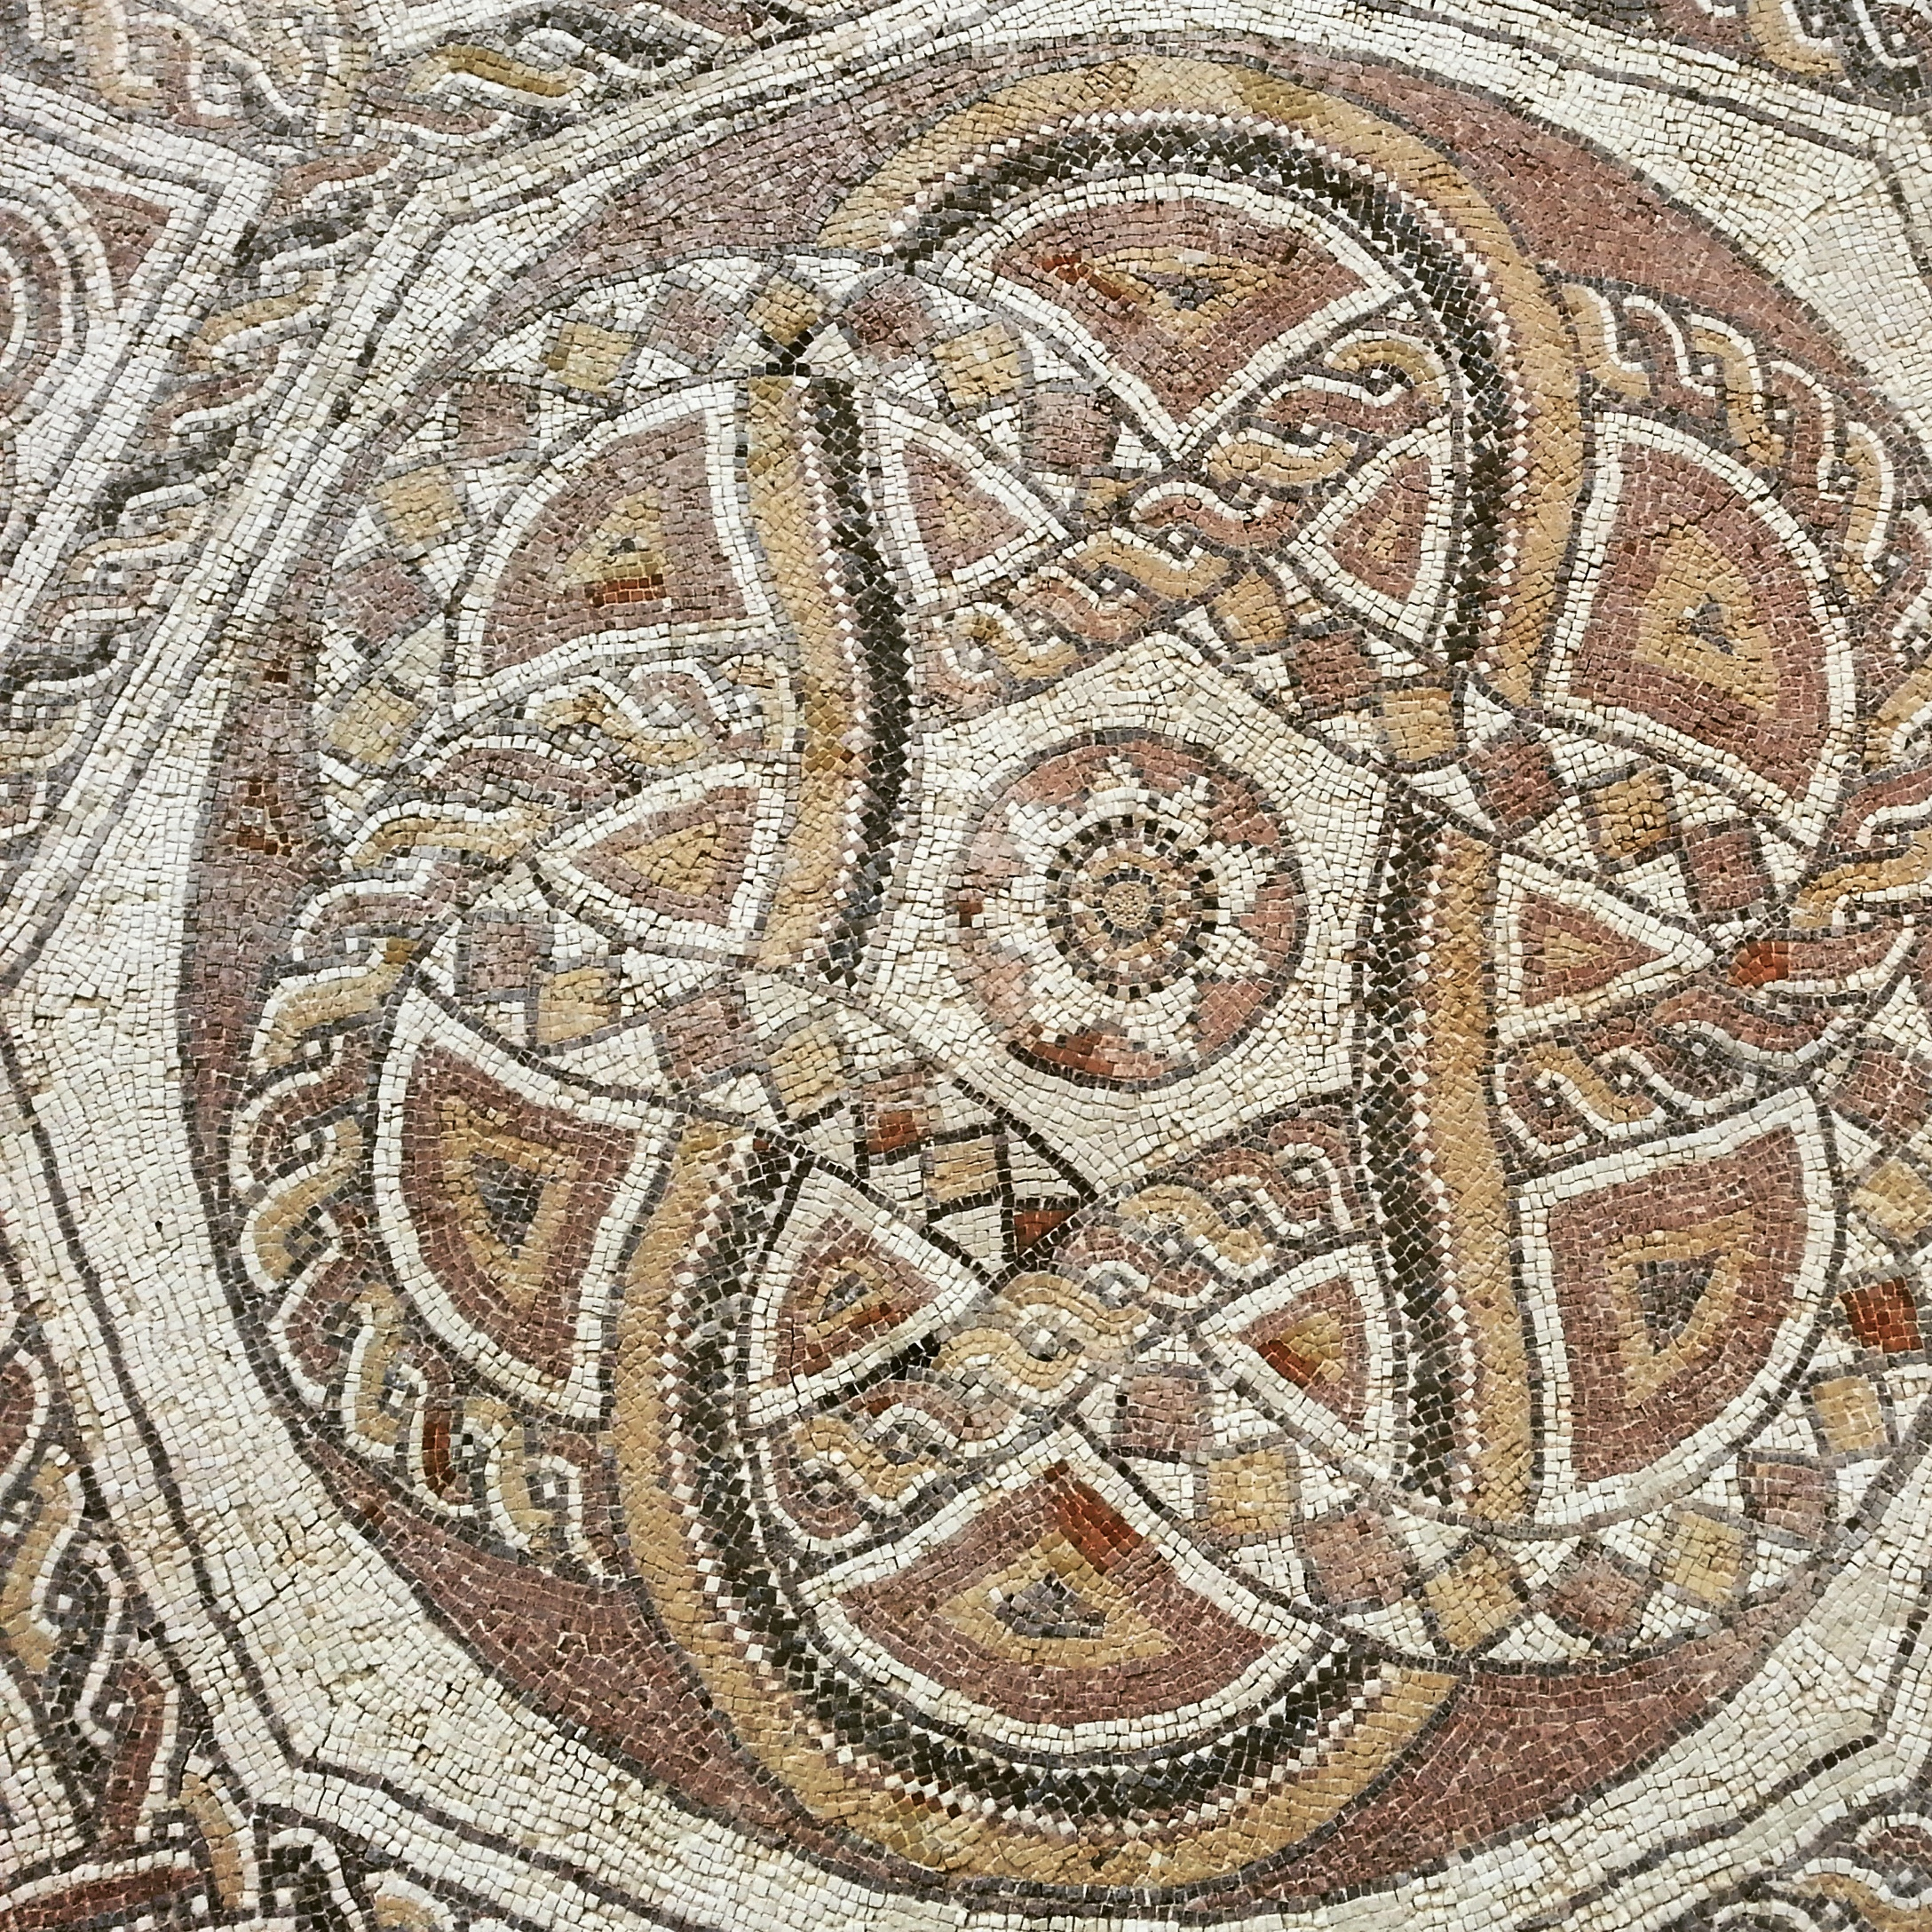 Byzantine period mosaic on display at the Inn of the Good Samaritan